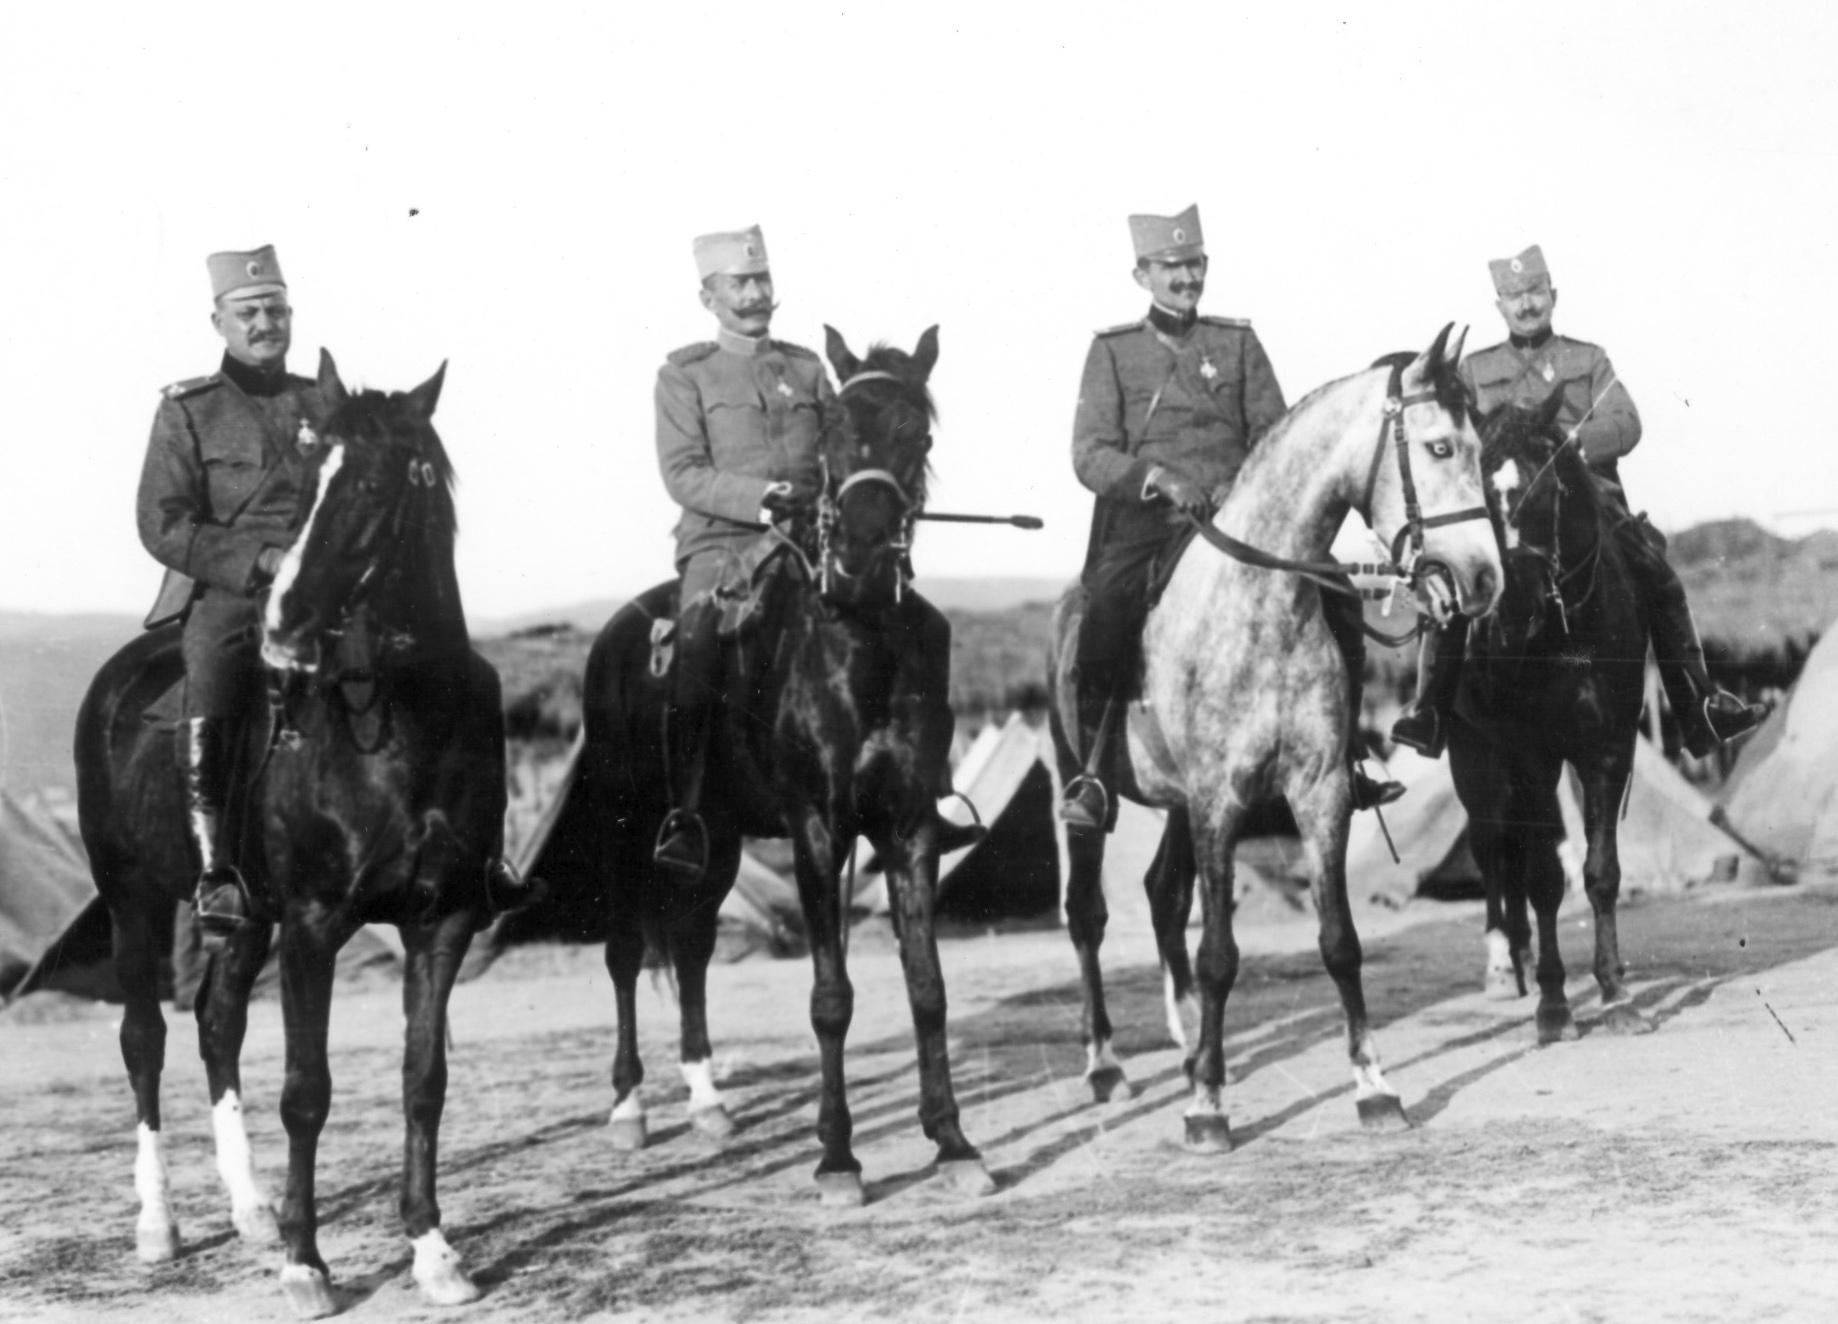 NA DANAŠNJI DAN: Komandant Julije Vapa i slavna četa srpske vojske oslobodila Inđiju